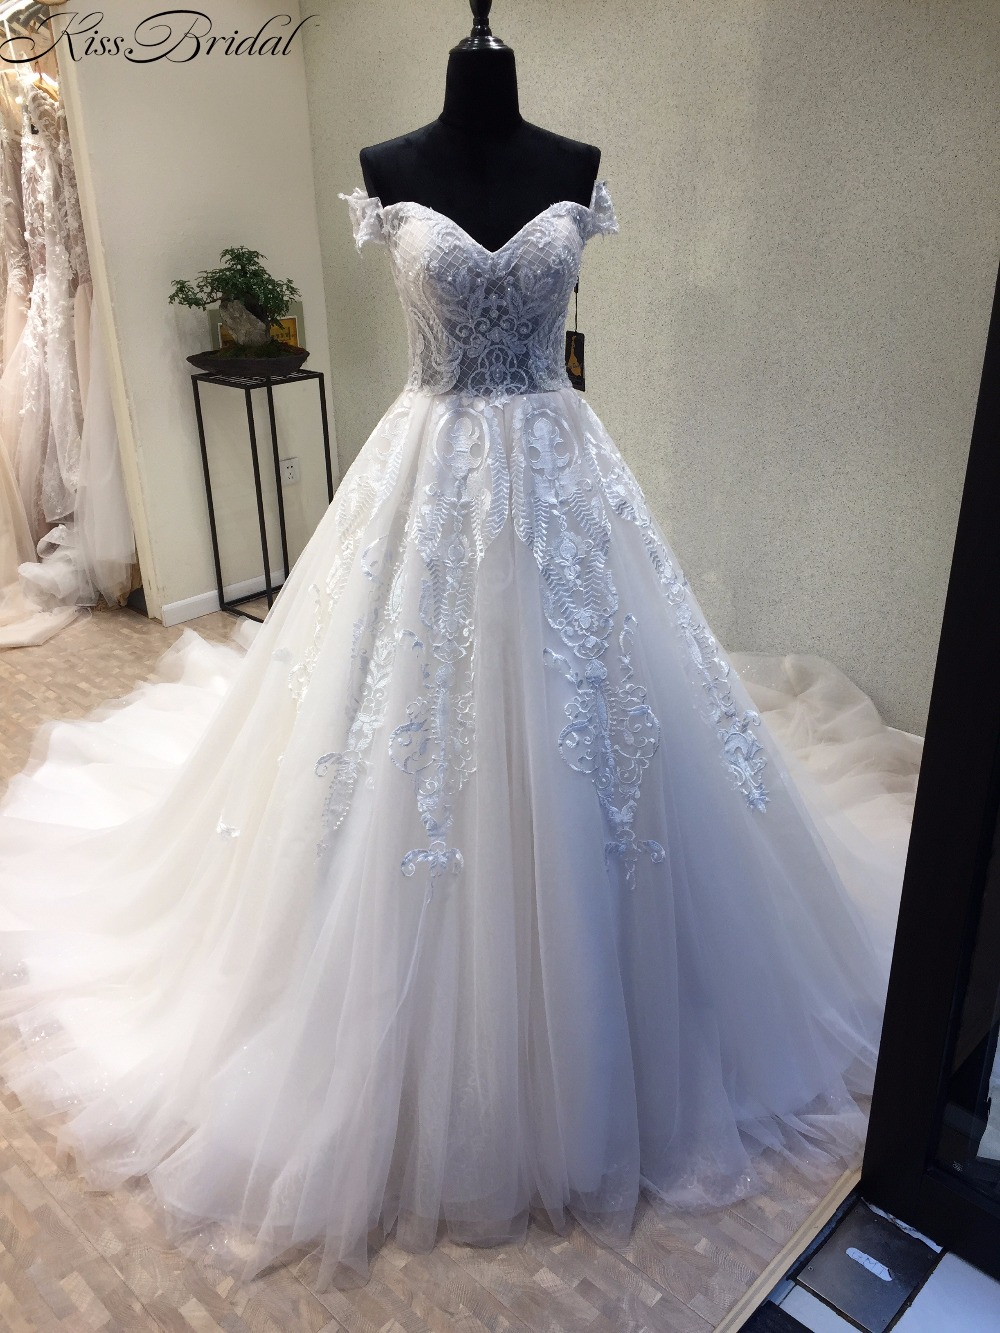 Vestidos de novia de la vendimia blanca 2017 sin mangas del amor - Vestidos de novia